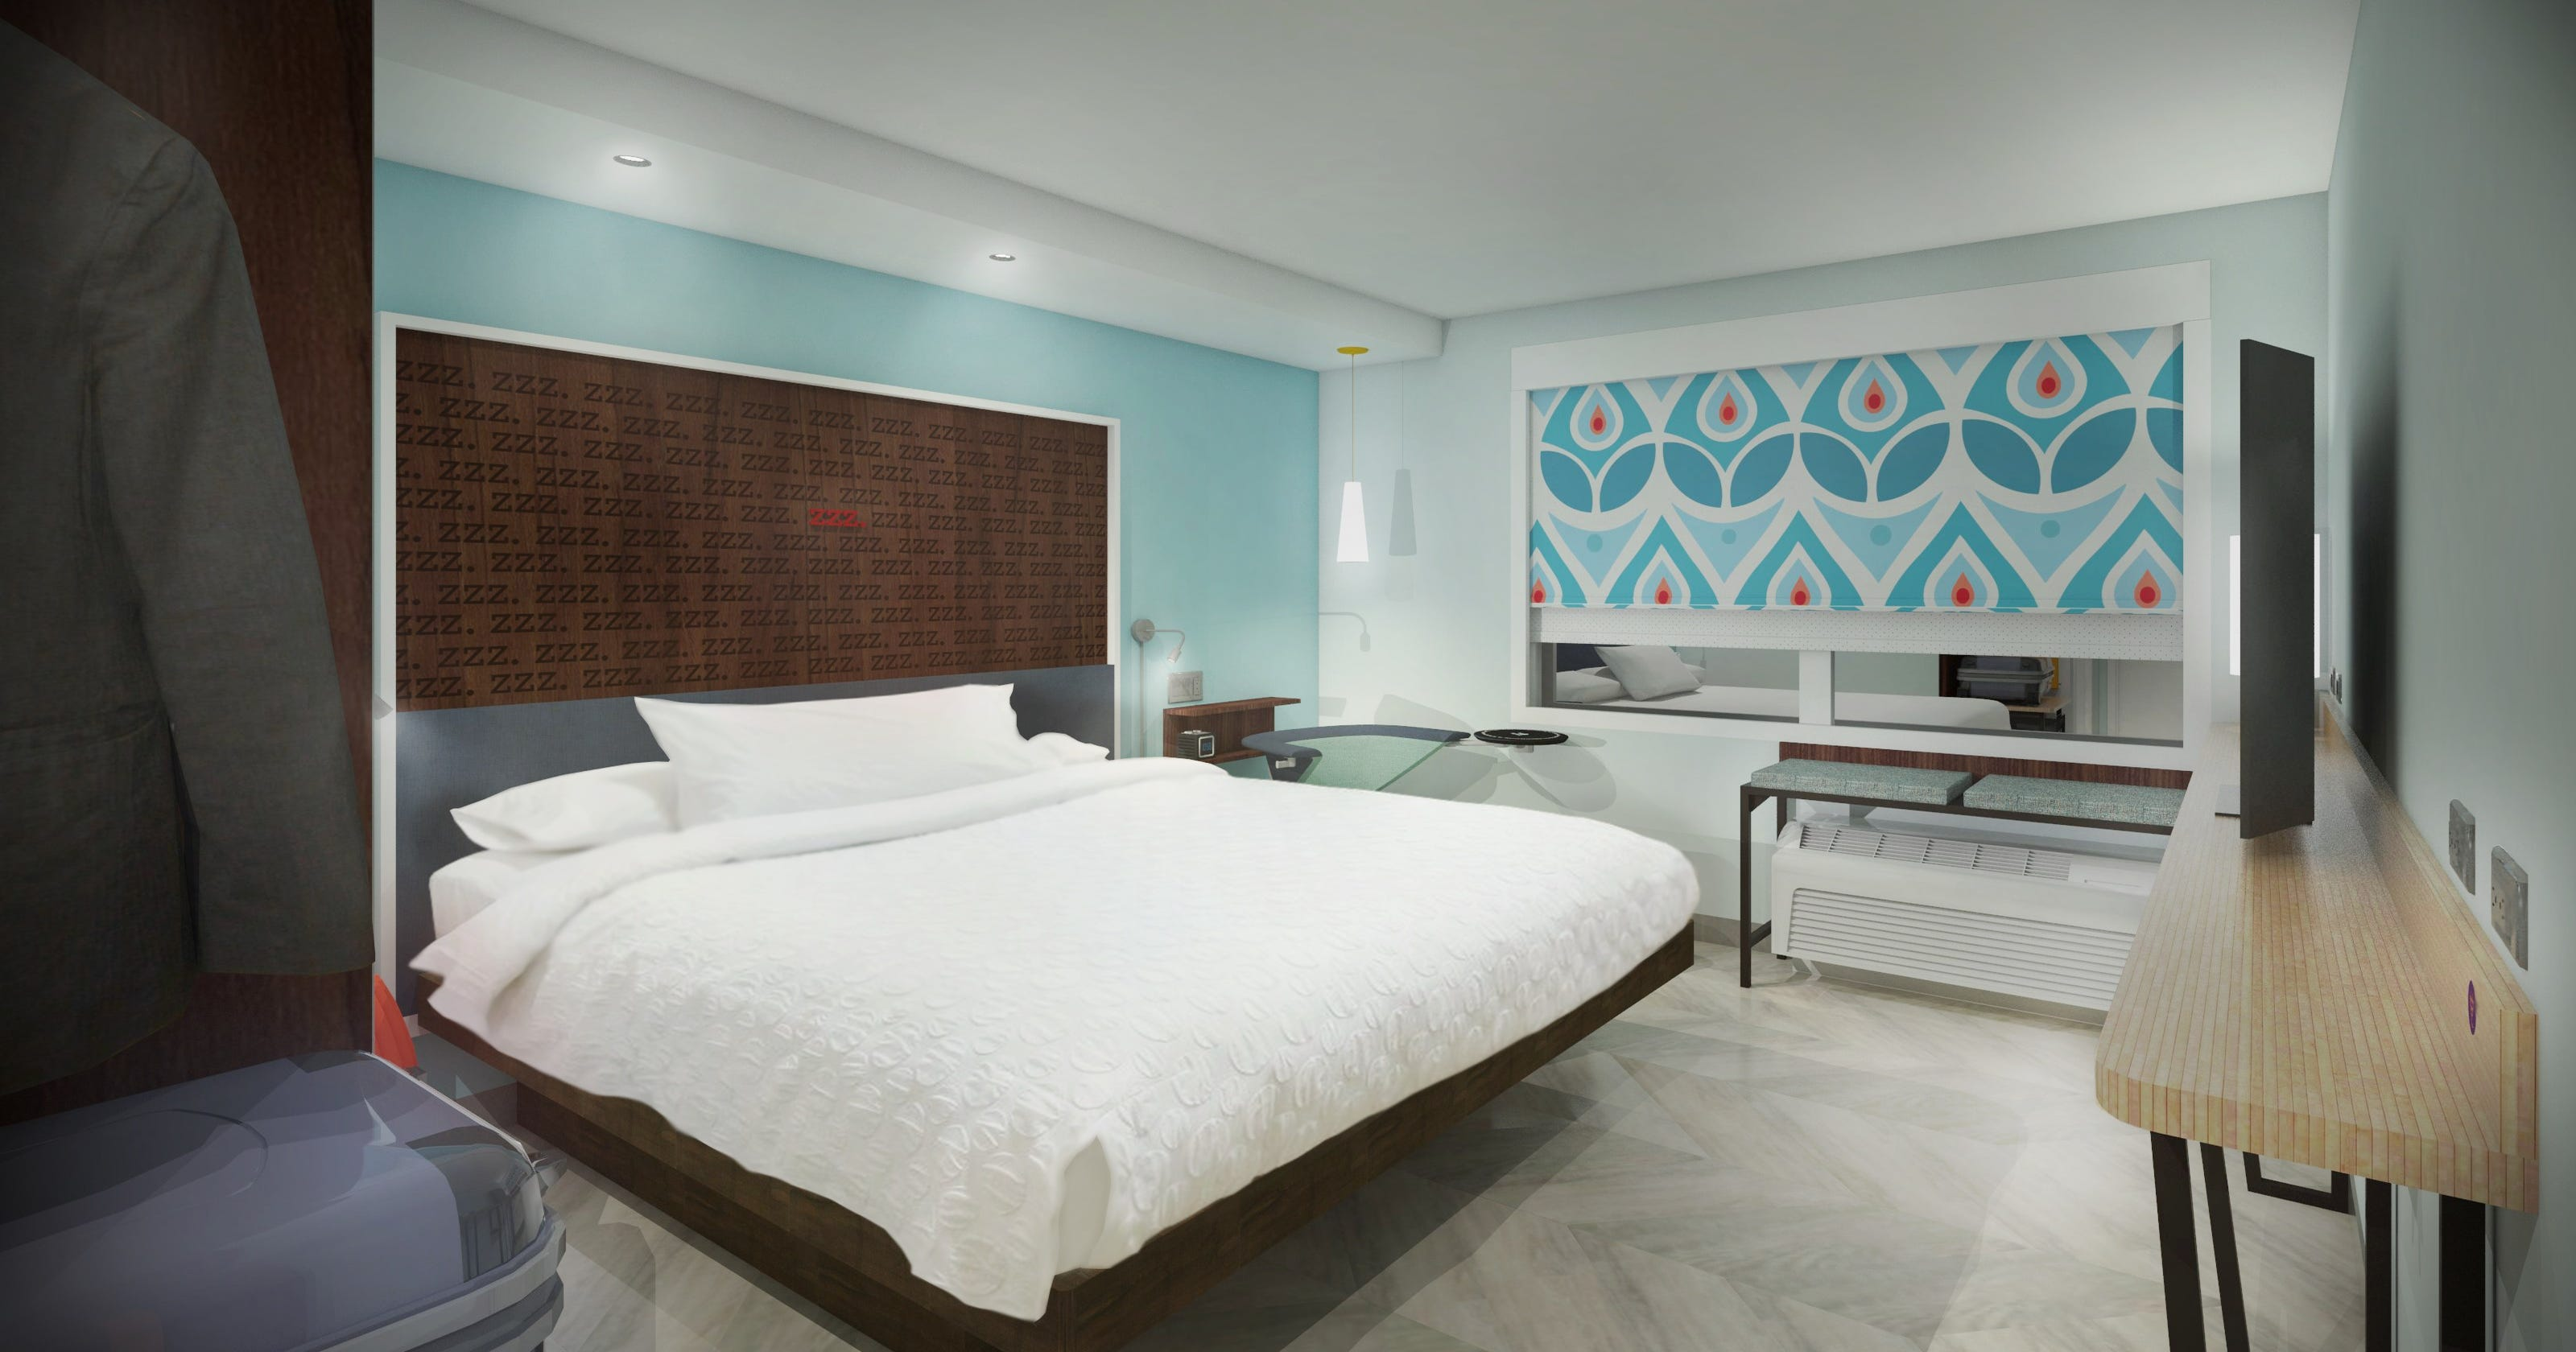 Hilton Announces New Affordable Hotel Brand Tru